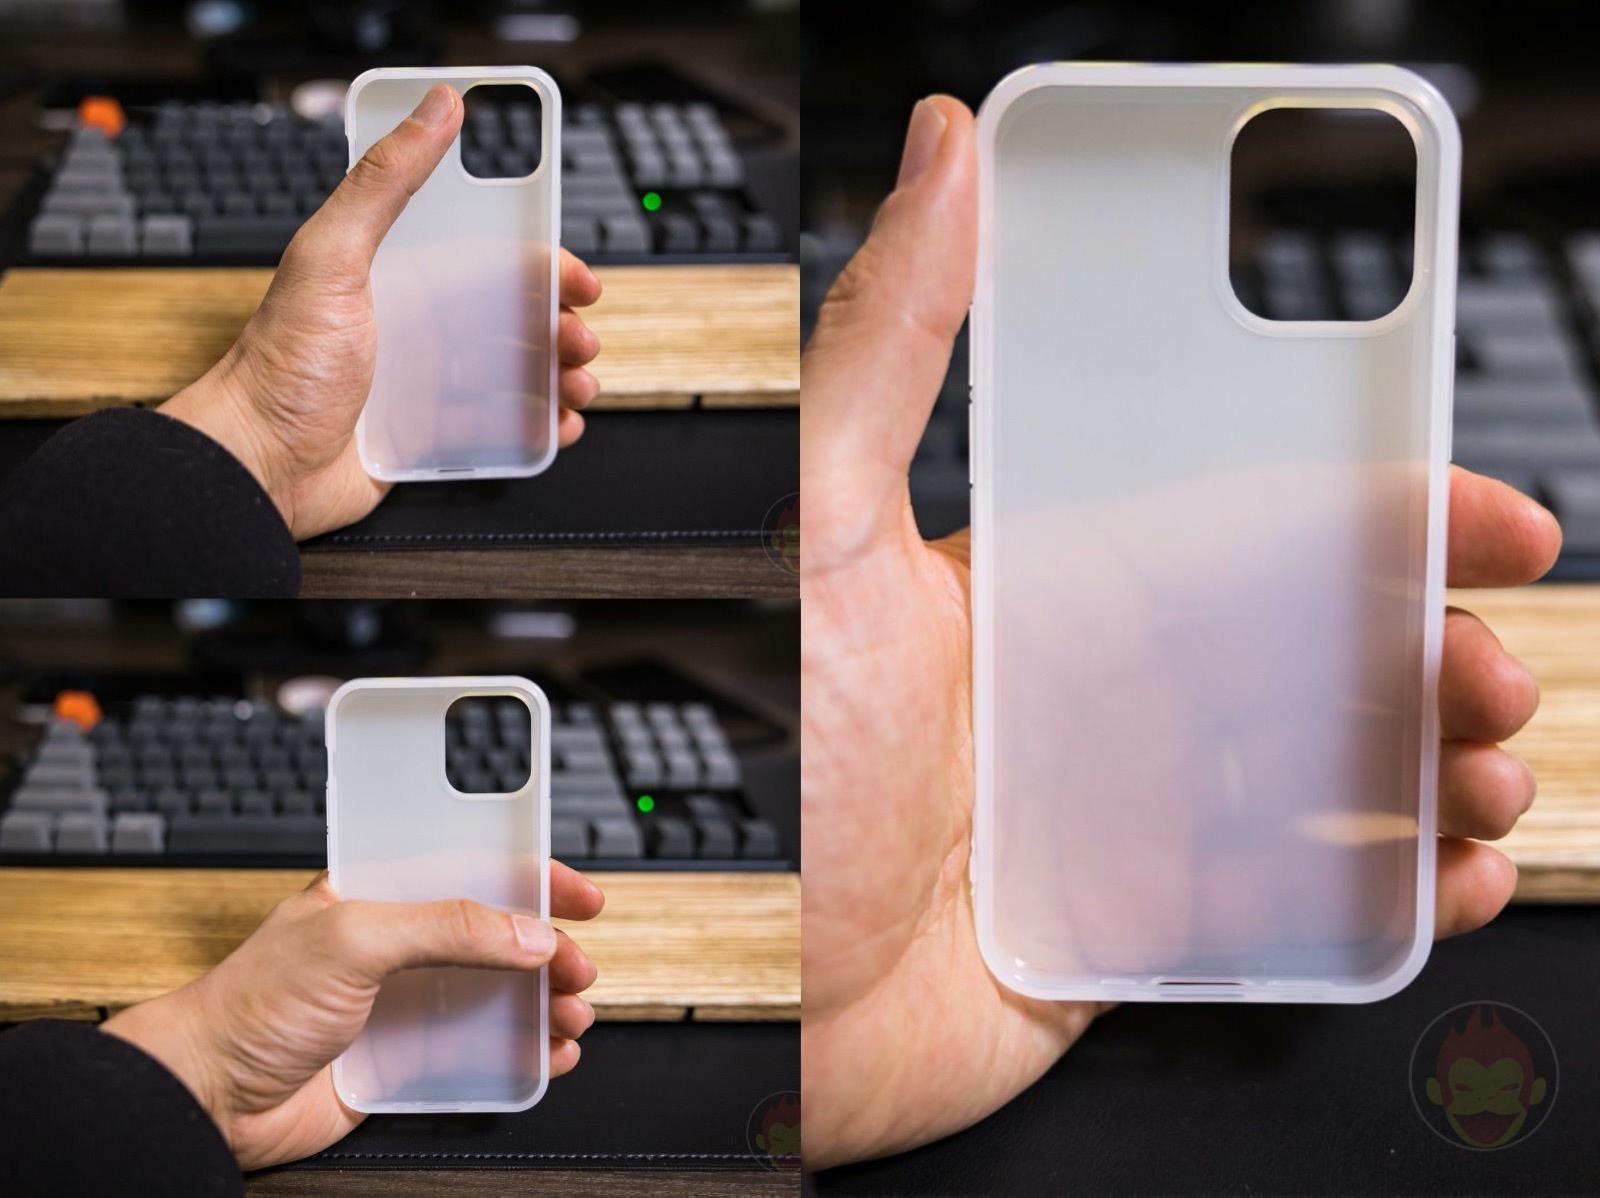 Iphone 12 mini case size